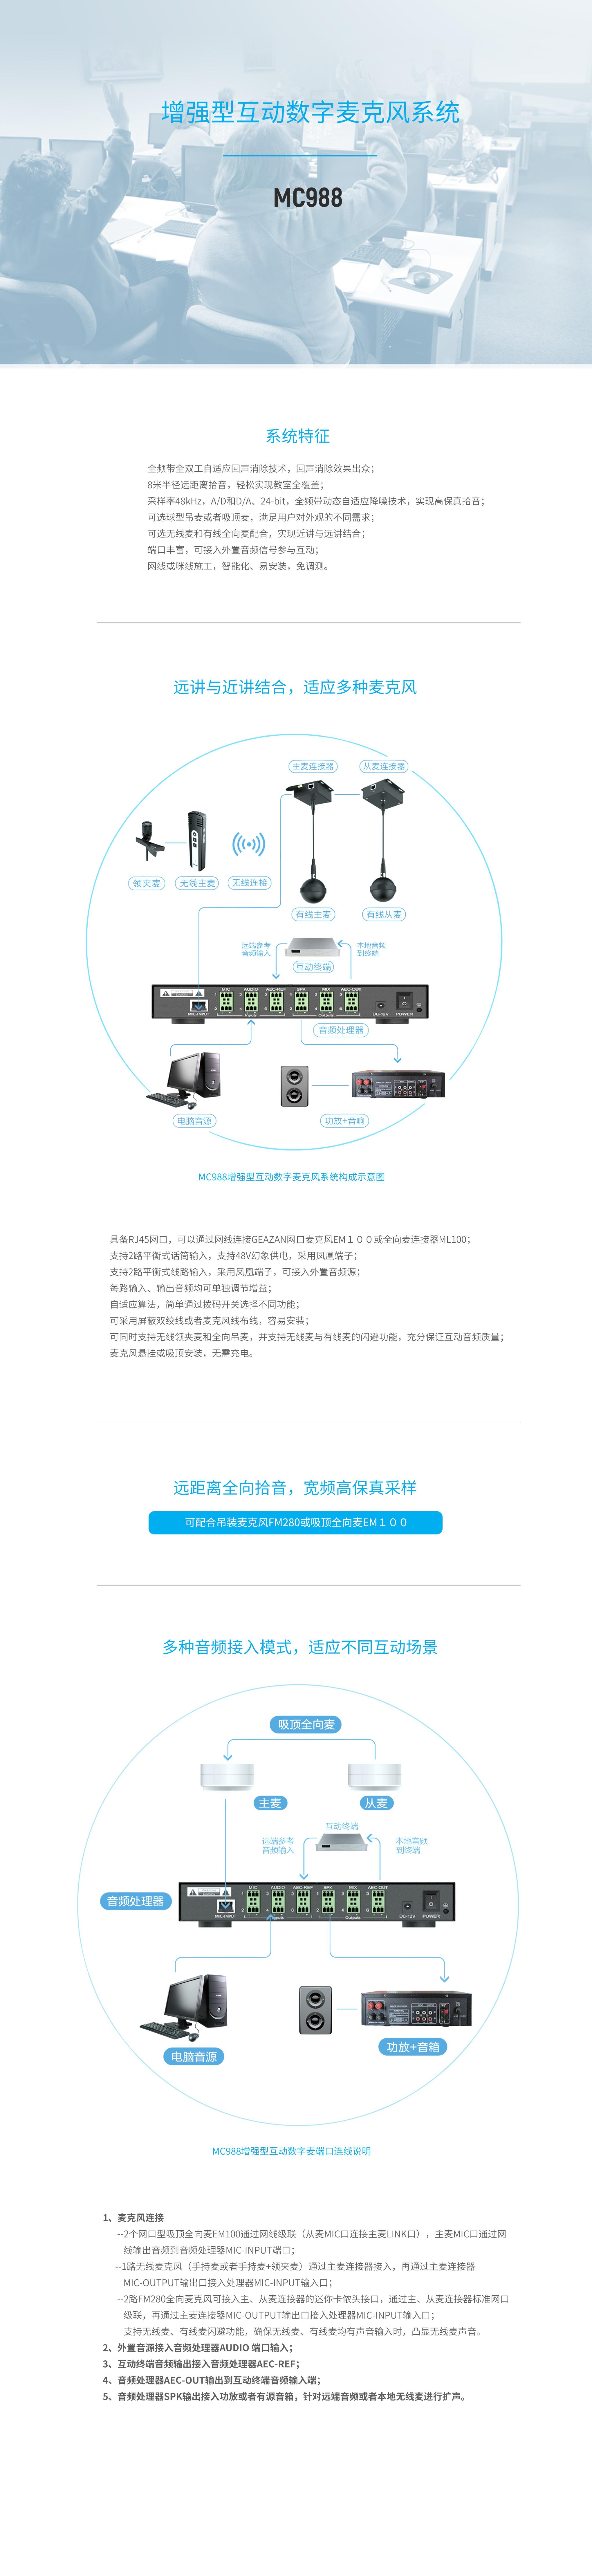 MC988增强型互动数字麦克风系统.jpg